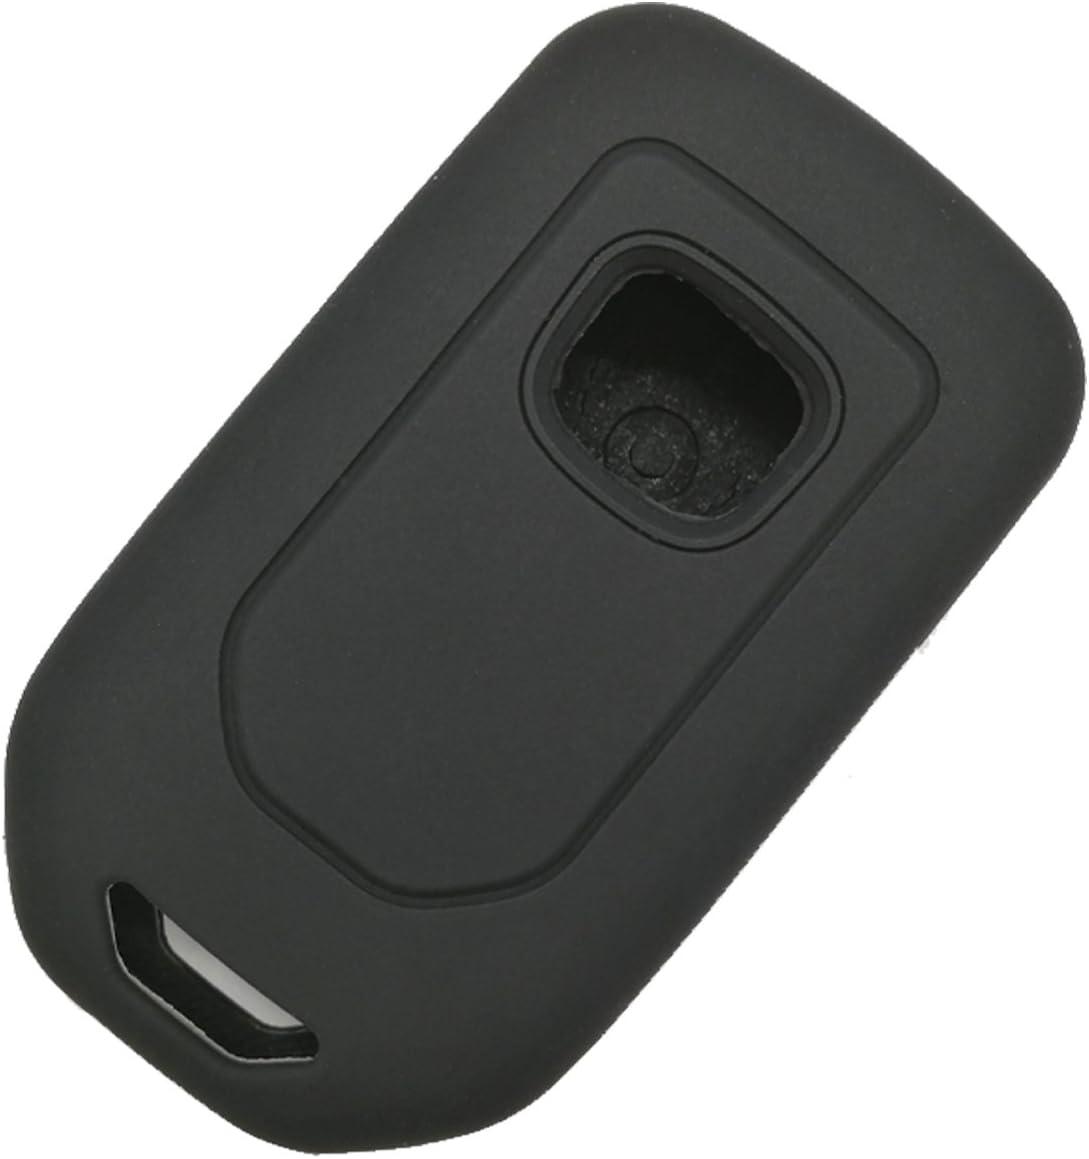 2Pcs Coolbestda 7buttons Key fob Cover Remote Control Keyless Jacket Holder Bag Case for 2020 2019 2018 Honda Odyssey elite ex